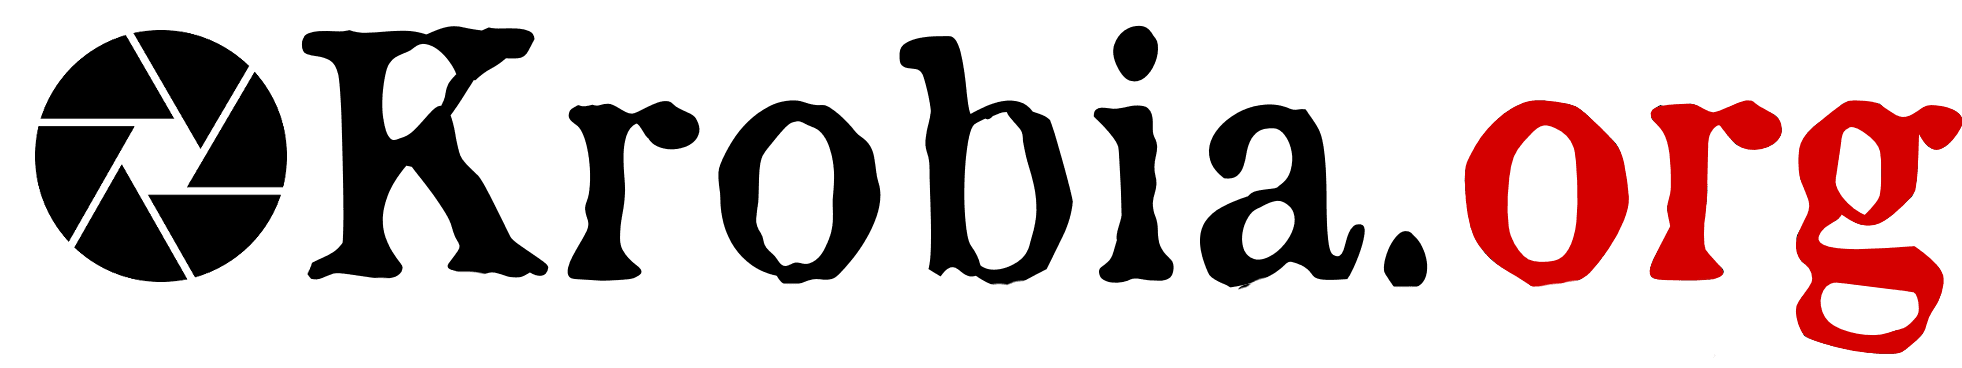 Krobia.org Fotografie i historia gminy Krobia